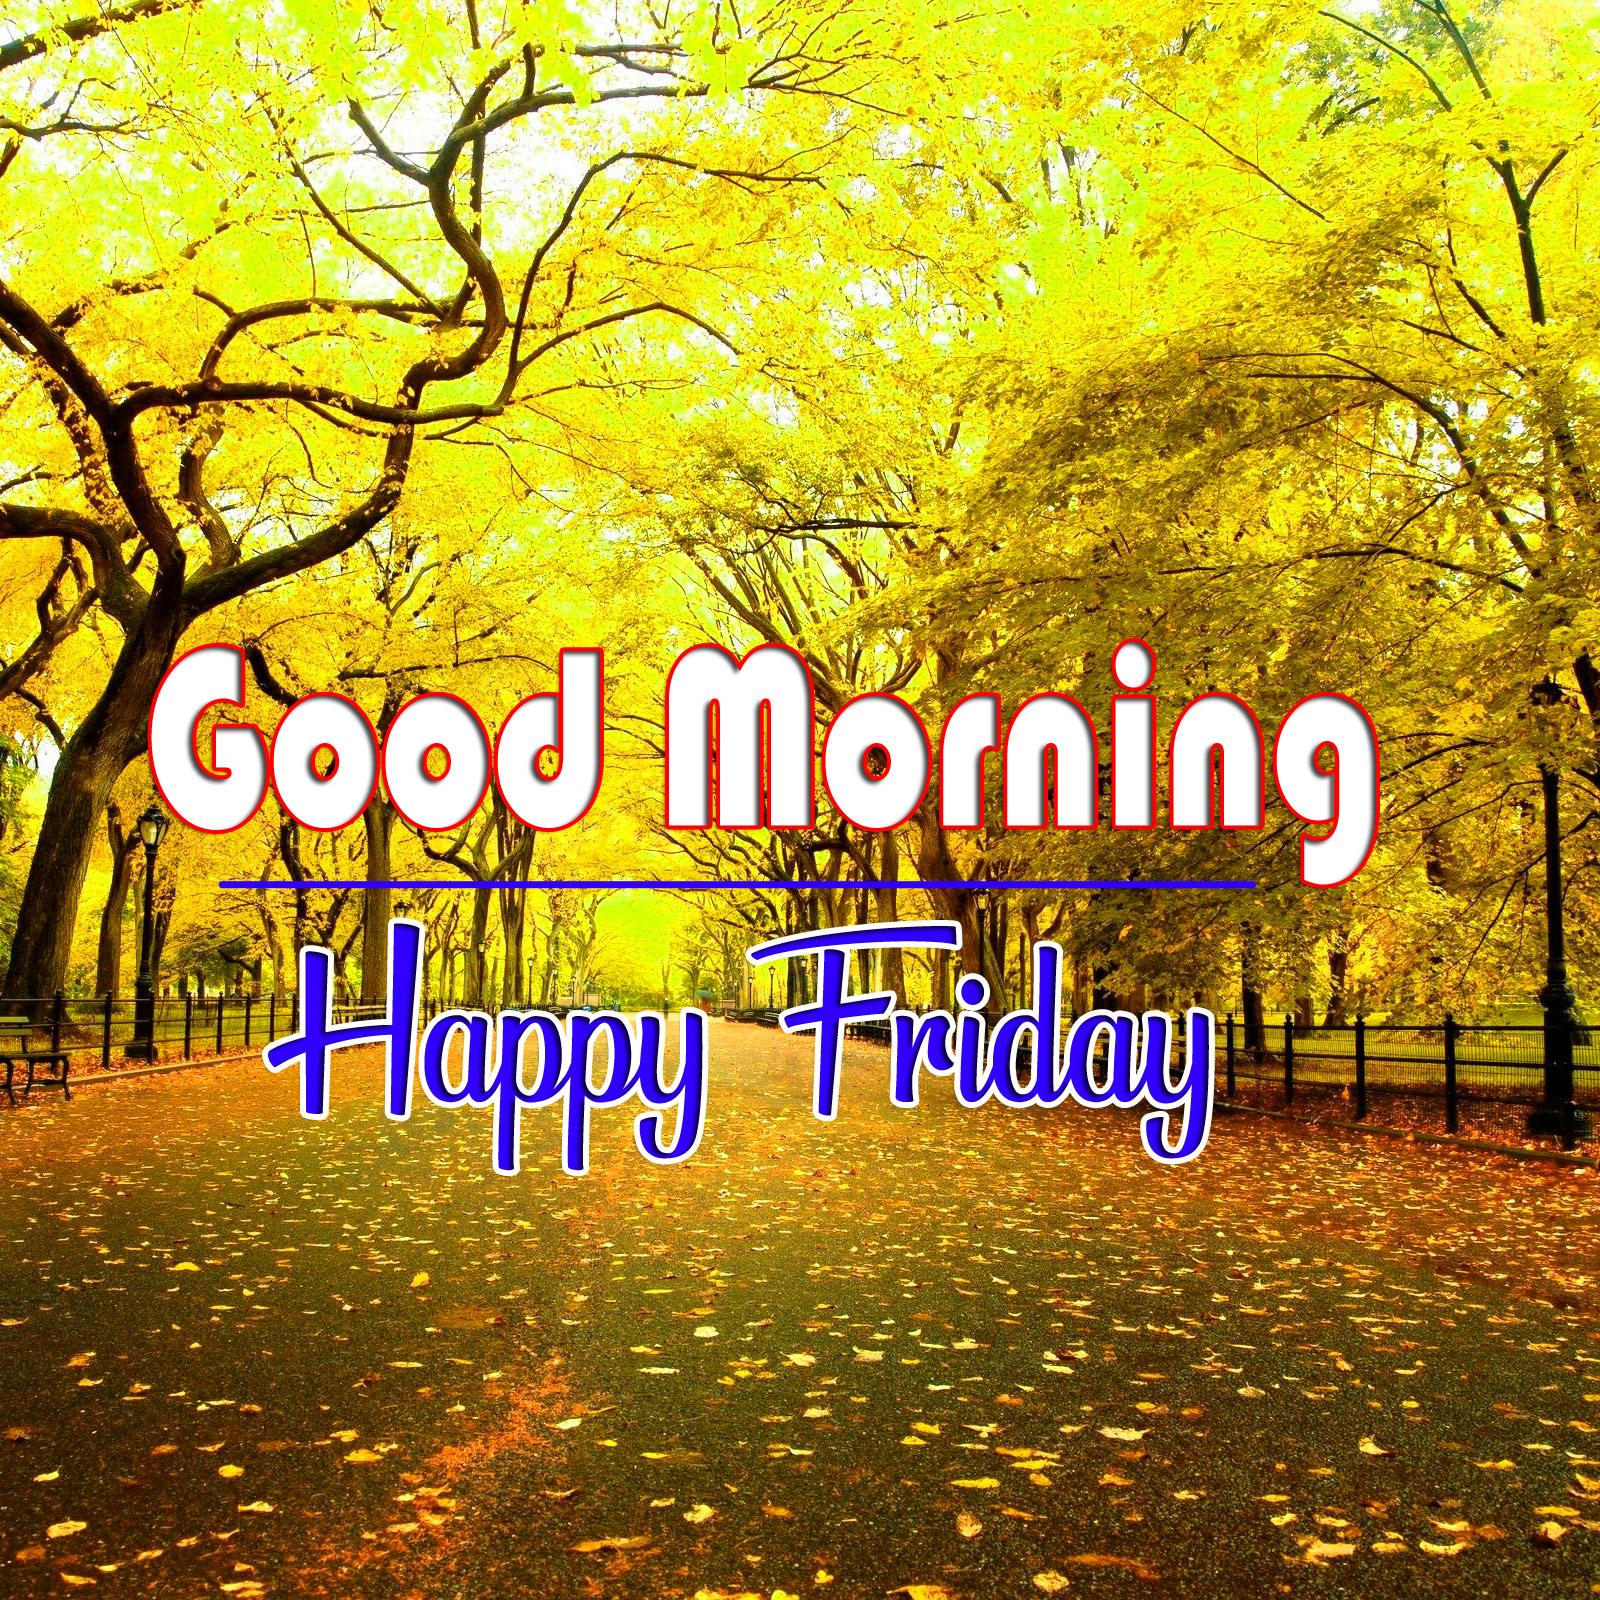 friday Good morning Wishes Pics Downlaod